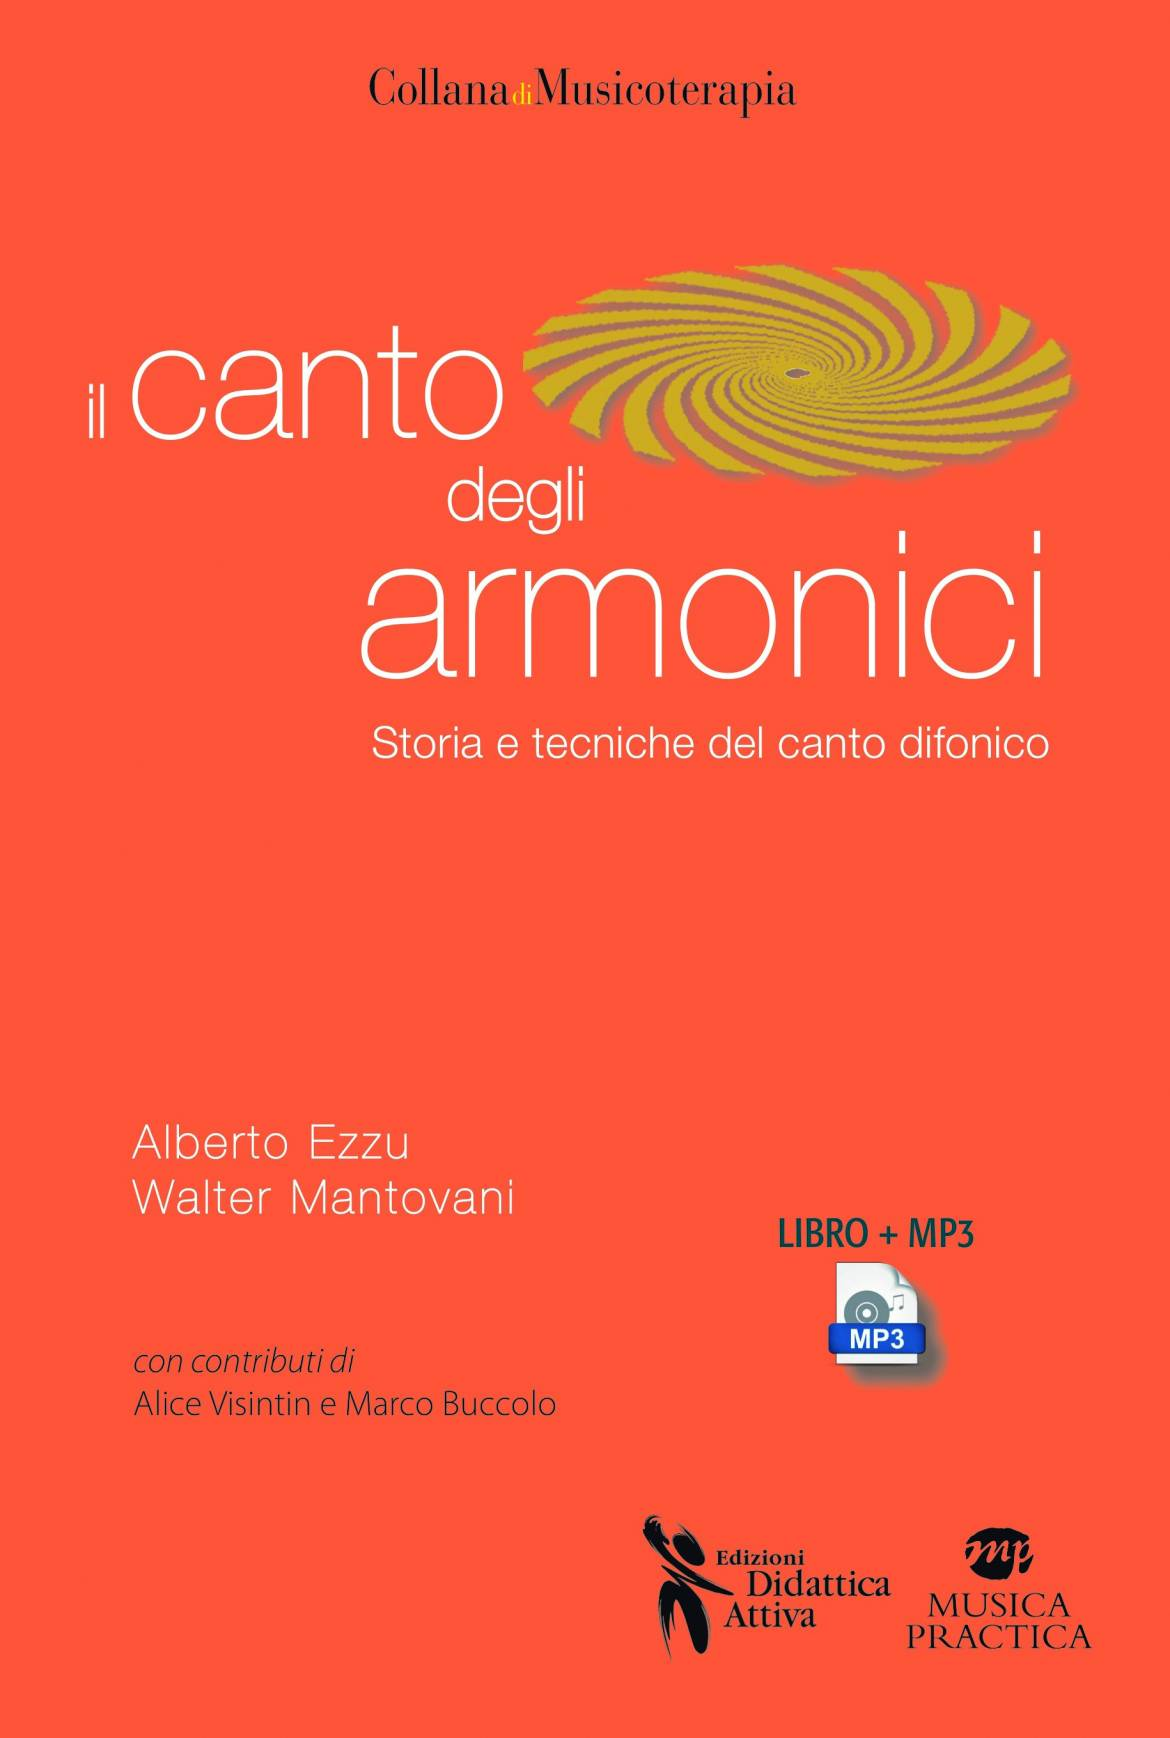 DA57-Il-canto-degli-armonici-2a-ediz_cop-CMYK.jpg